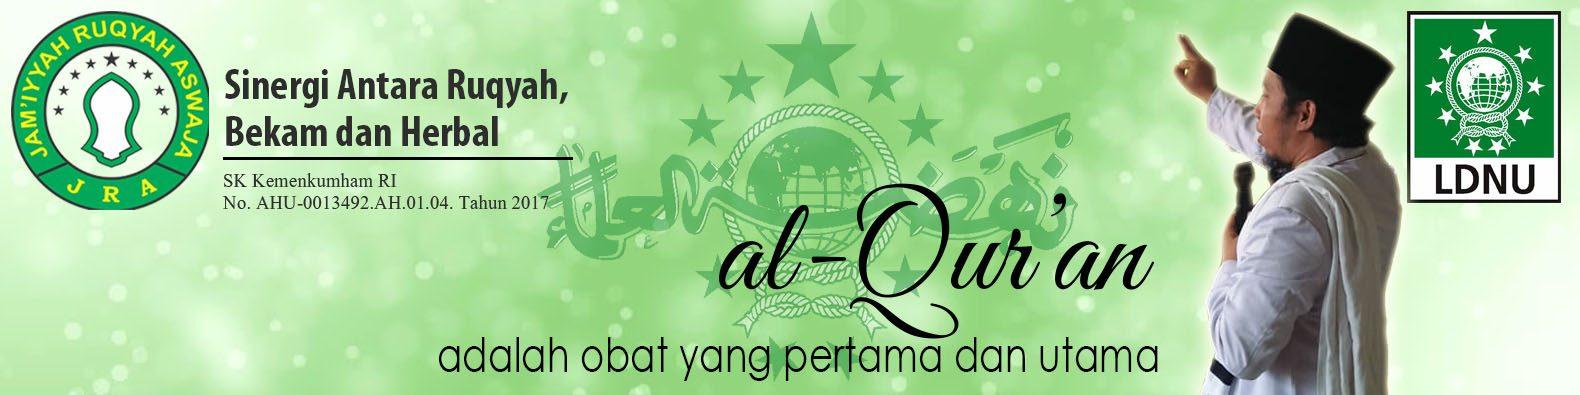 Jam'iyyah Ruqyah Aswaja ( JRA )